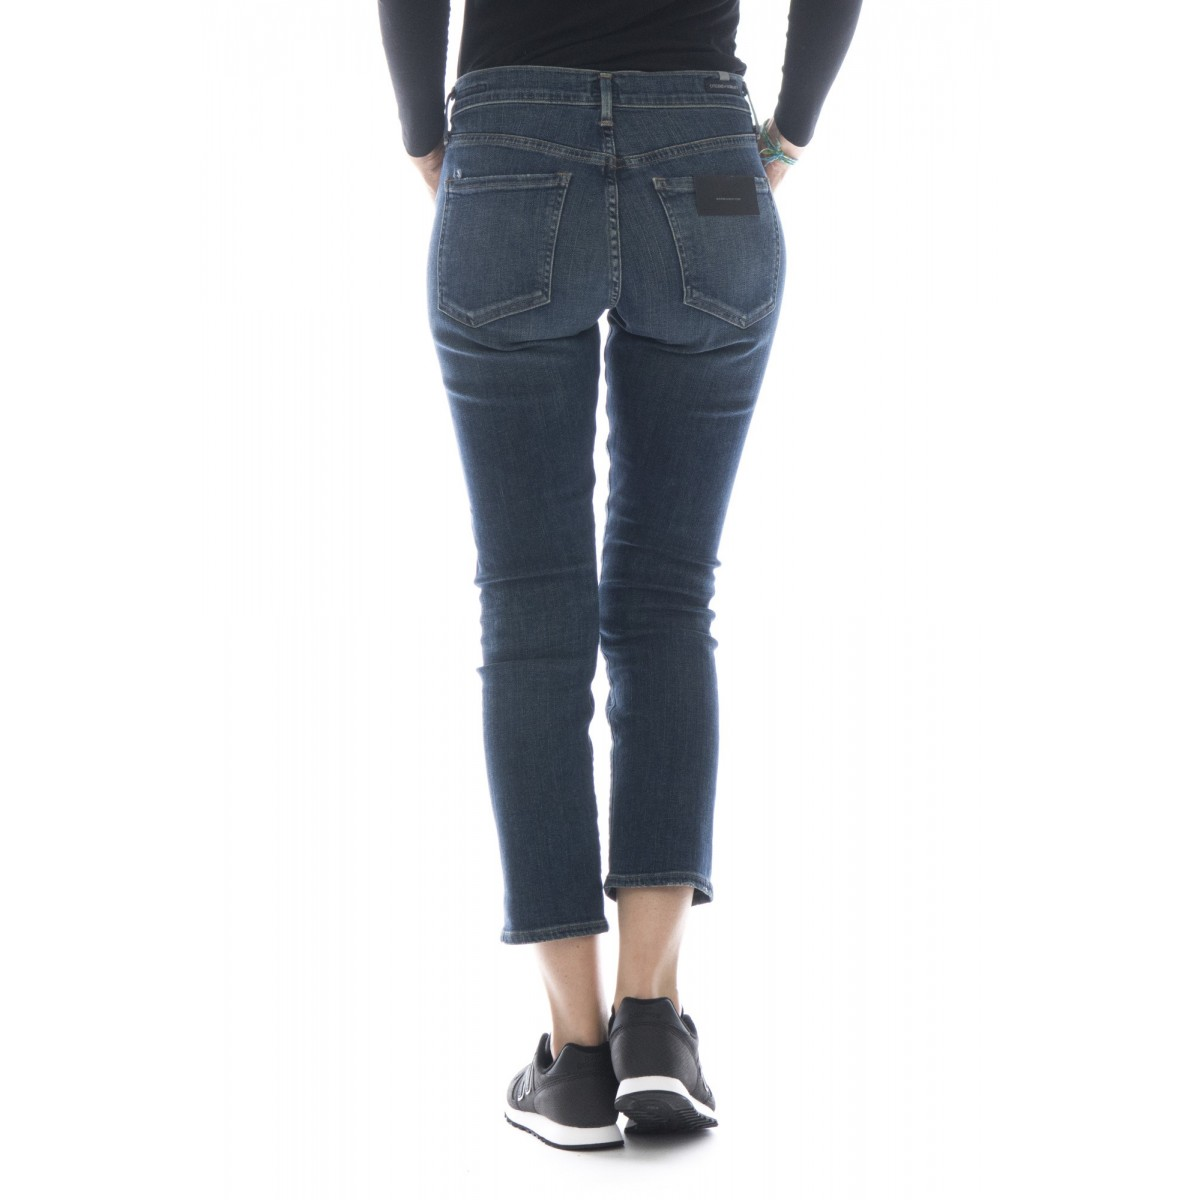 Jeans - Rival elsa